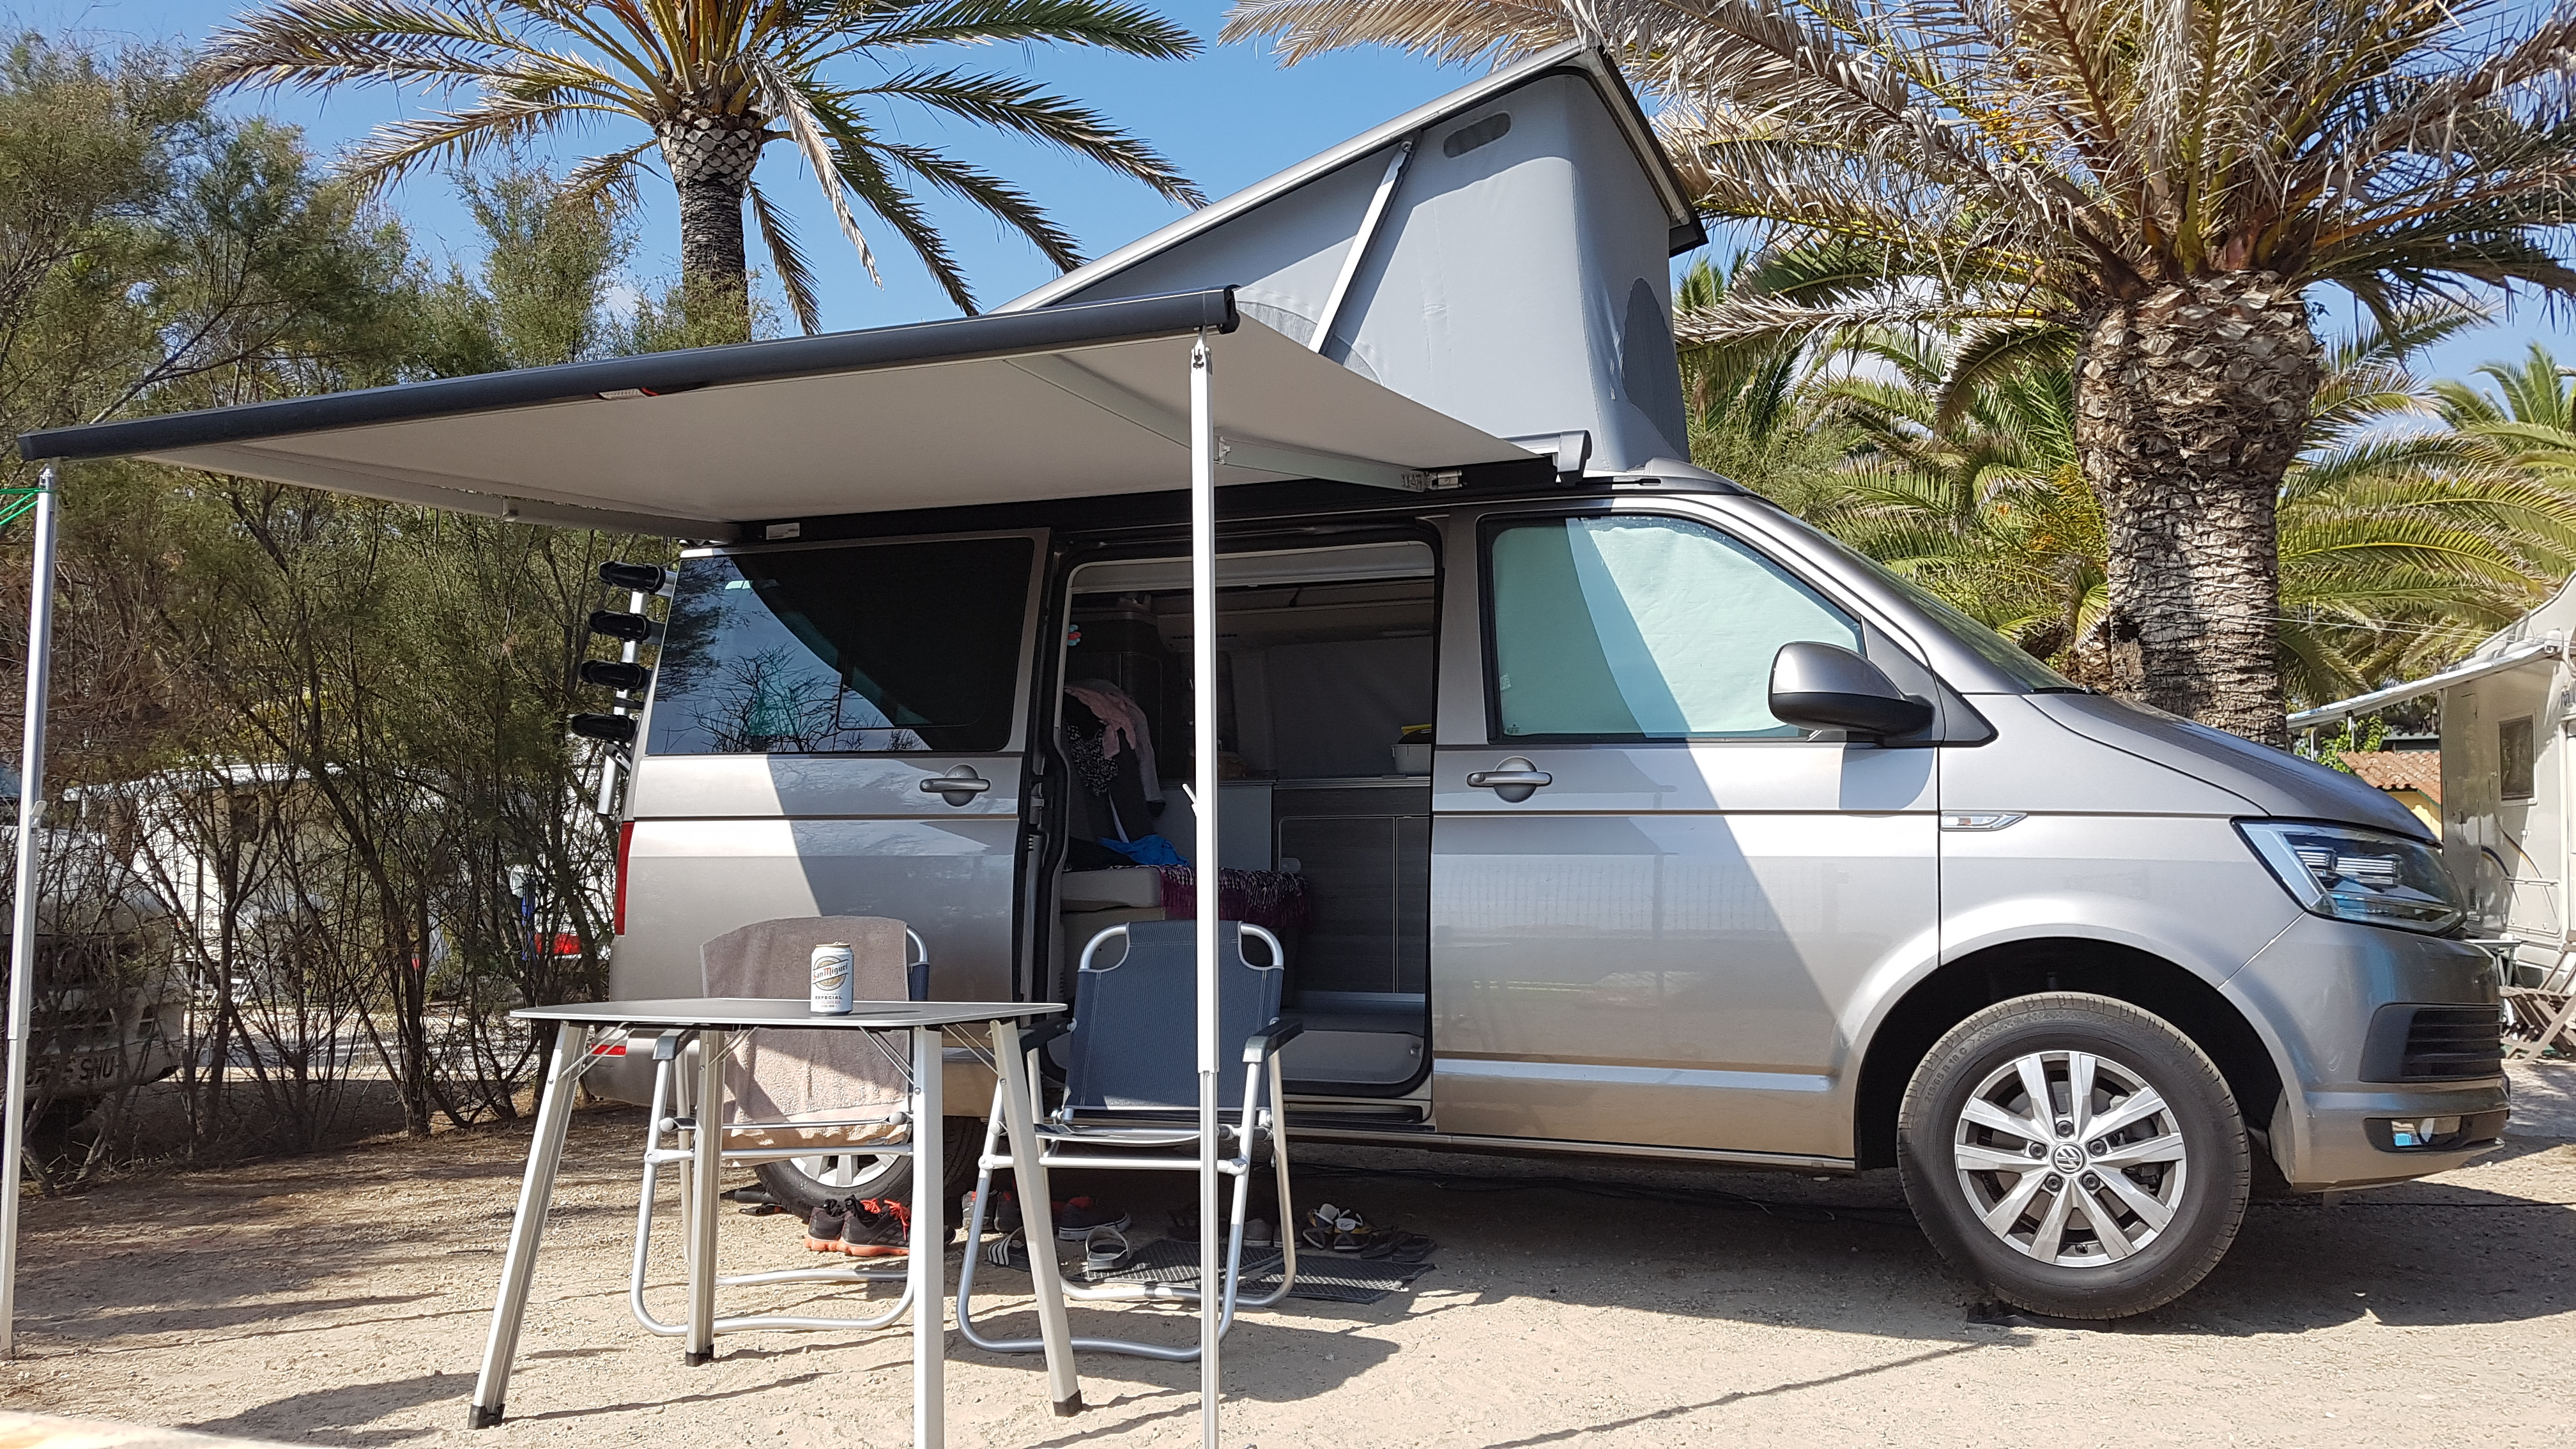 unsere mieter in spanien oktober 2016 danke f r die bilder vw california mieten vw camper. Black Bedroom Furniture Sets. Home Design Ideas